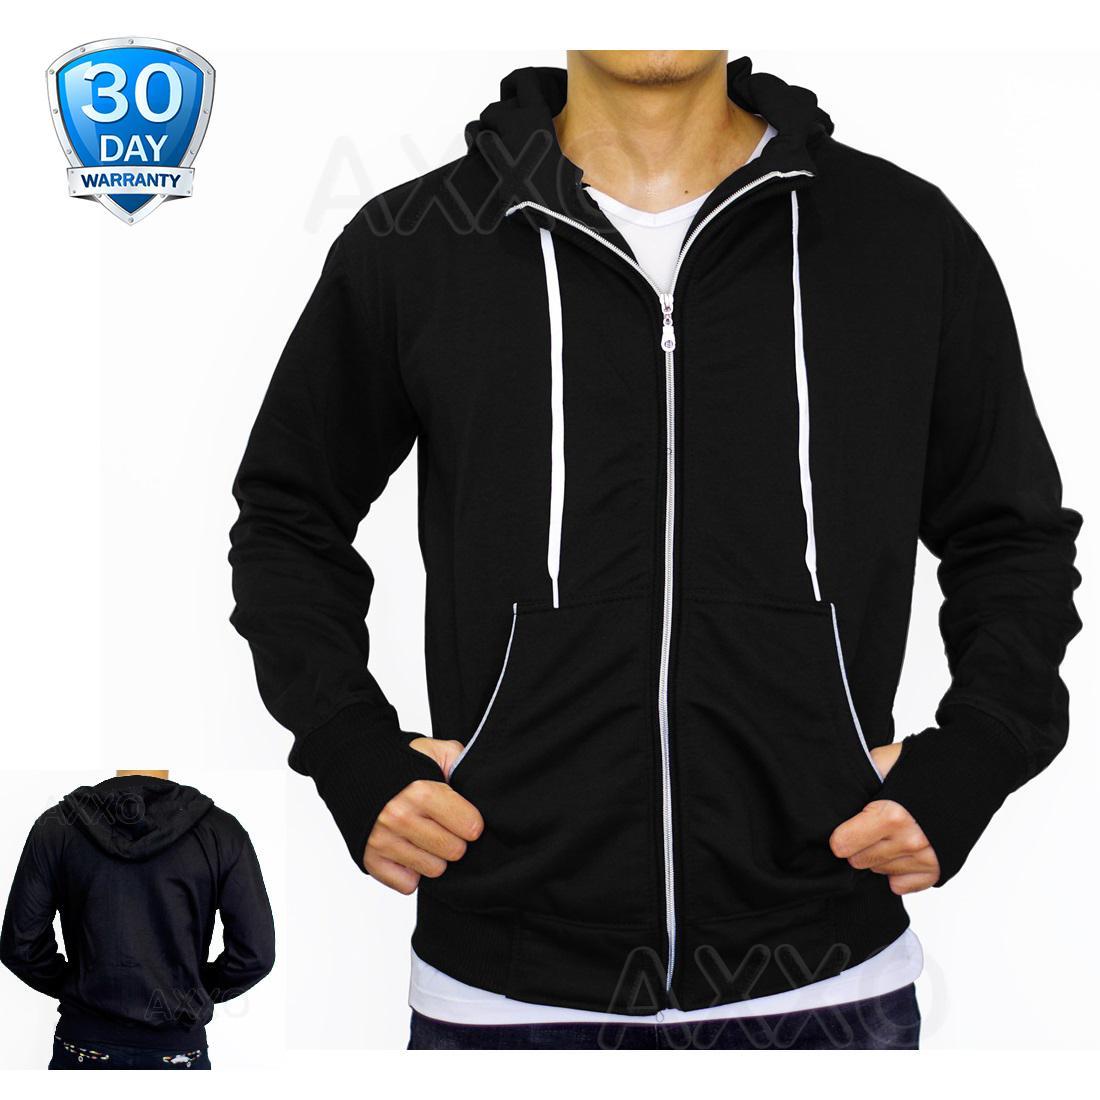 AXXO Jaket Pria Sweater Hoodie Zipper Polos Jaket Korea Jaket Suiter - Jaket Sweater Pria - AX004